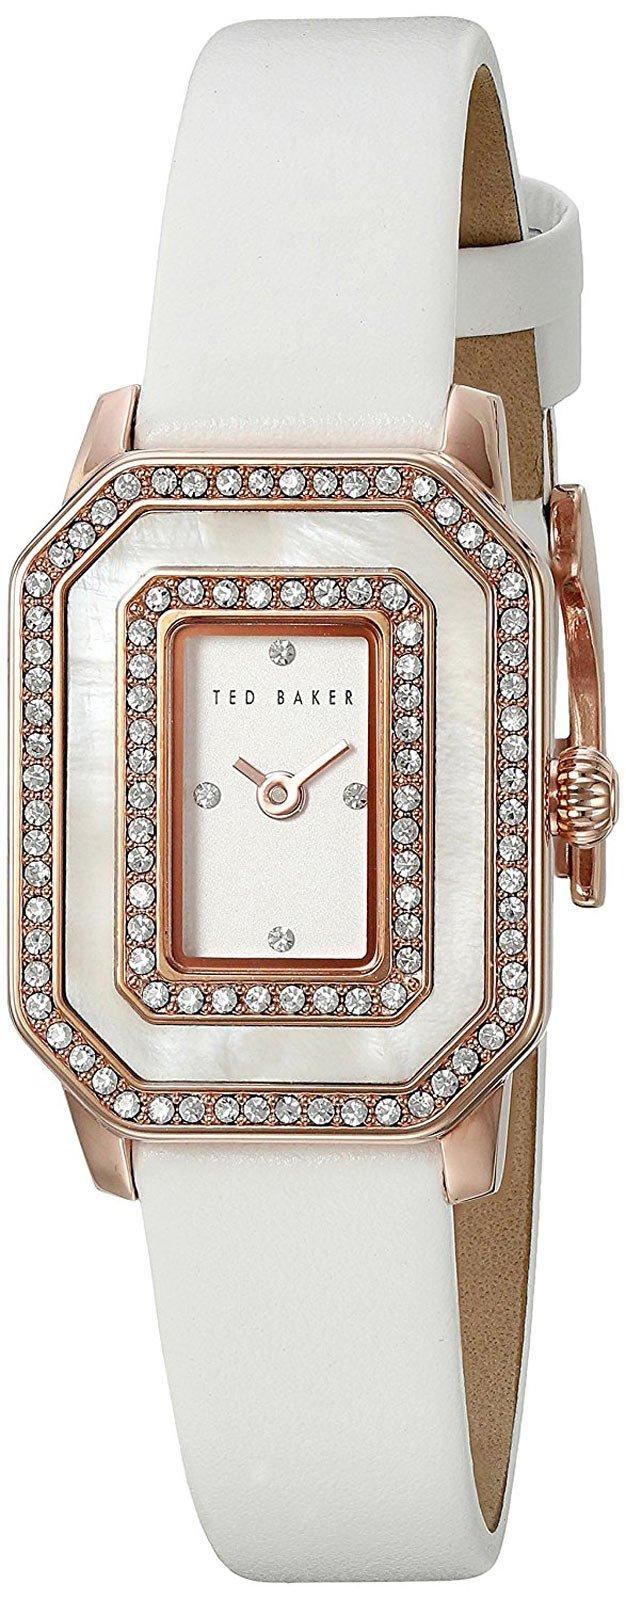 Ted Baker Women's 10023481 Glam Analog Display Japanese Quartz White Watch